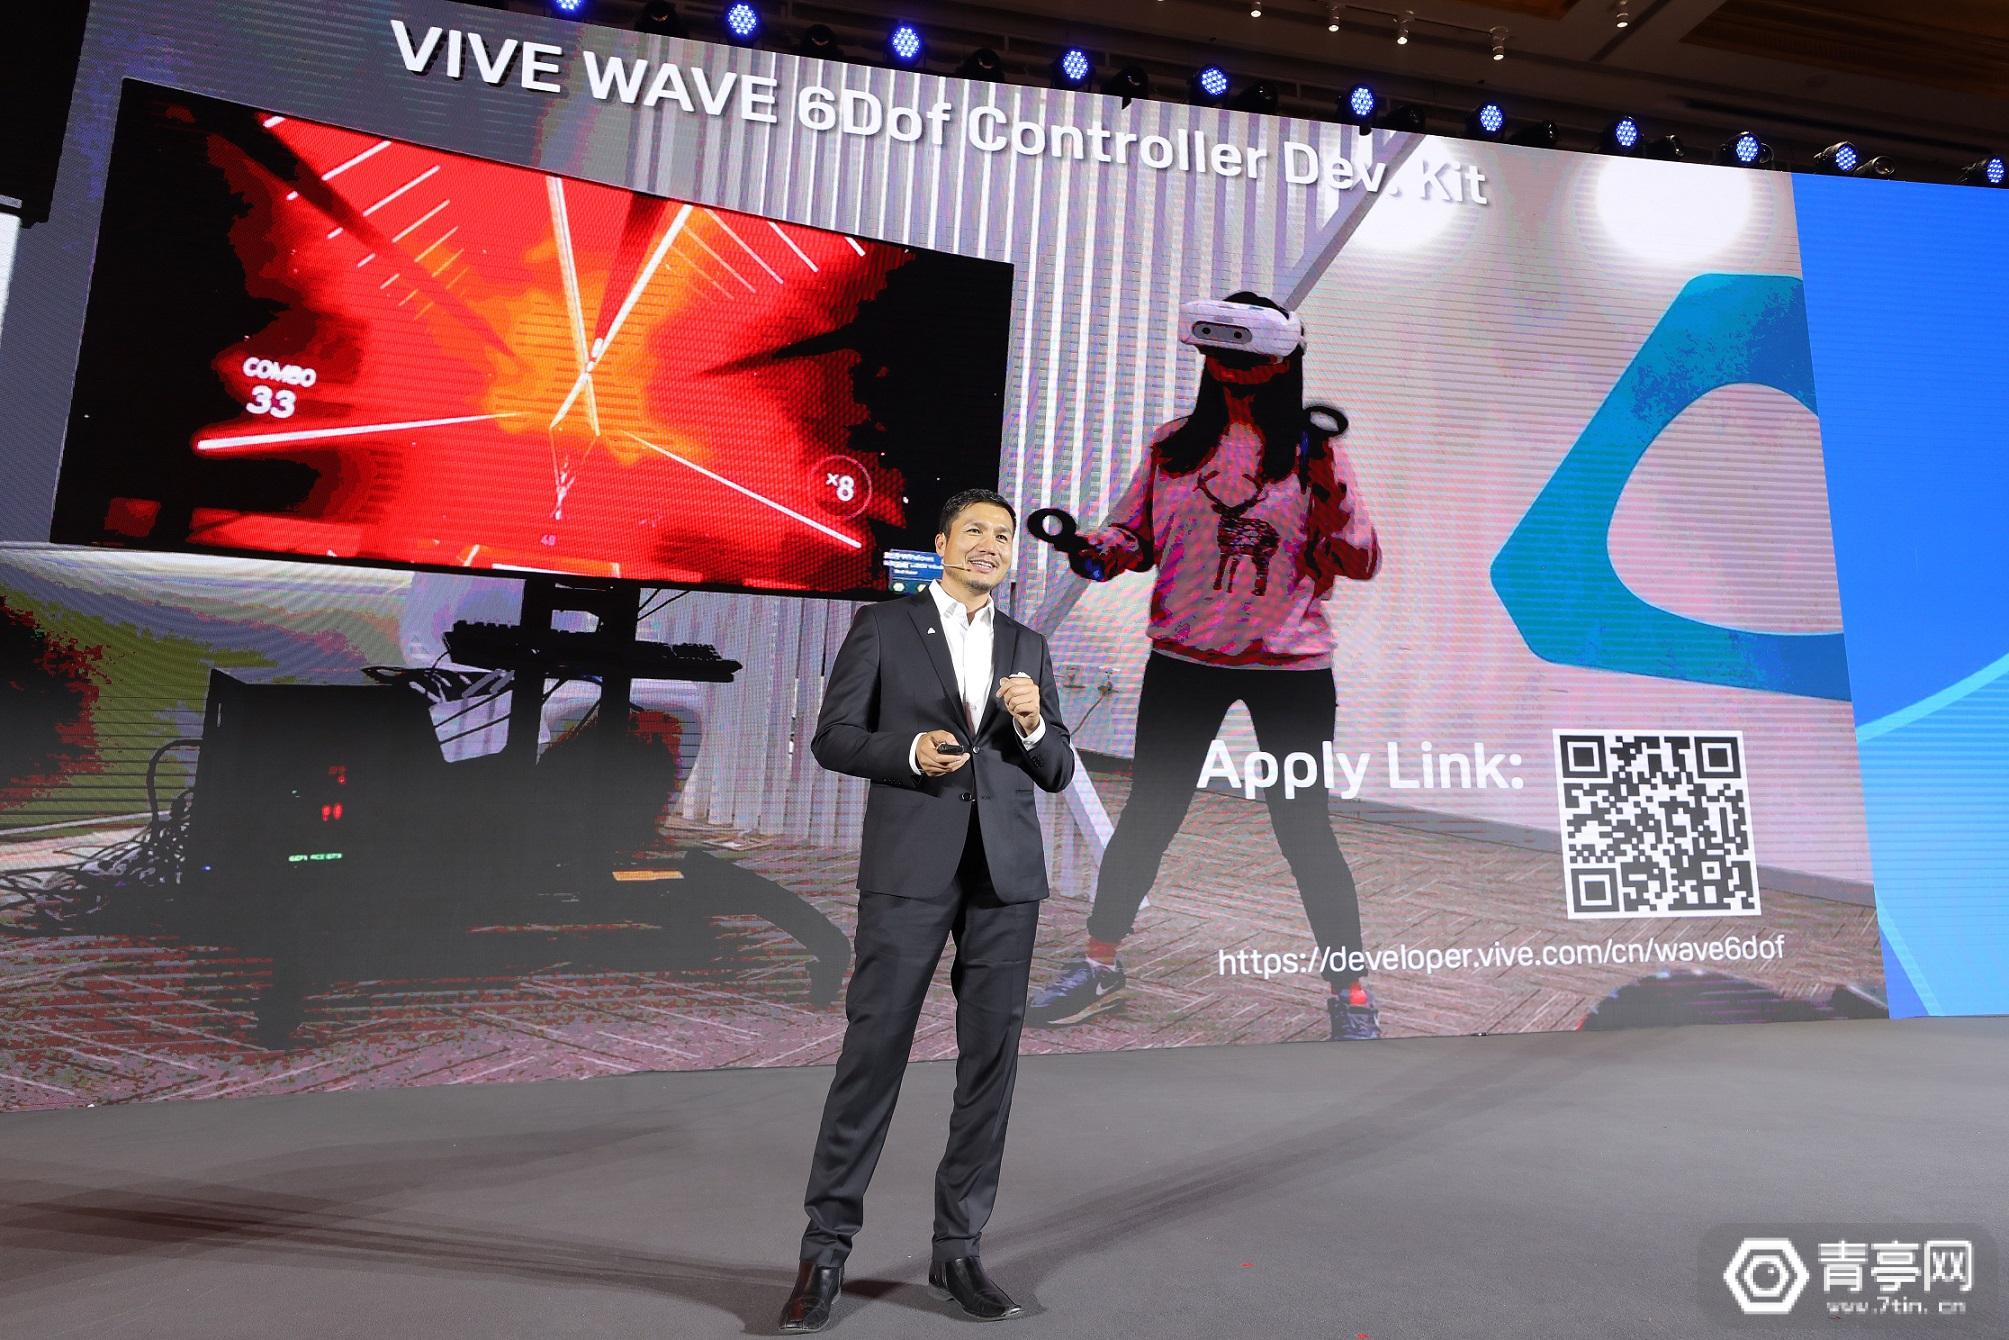 Vive Focus推6DoF手柄开发套件,Vive Pro加入手势追踪